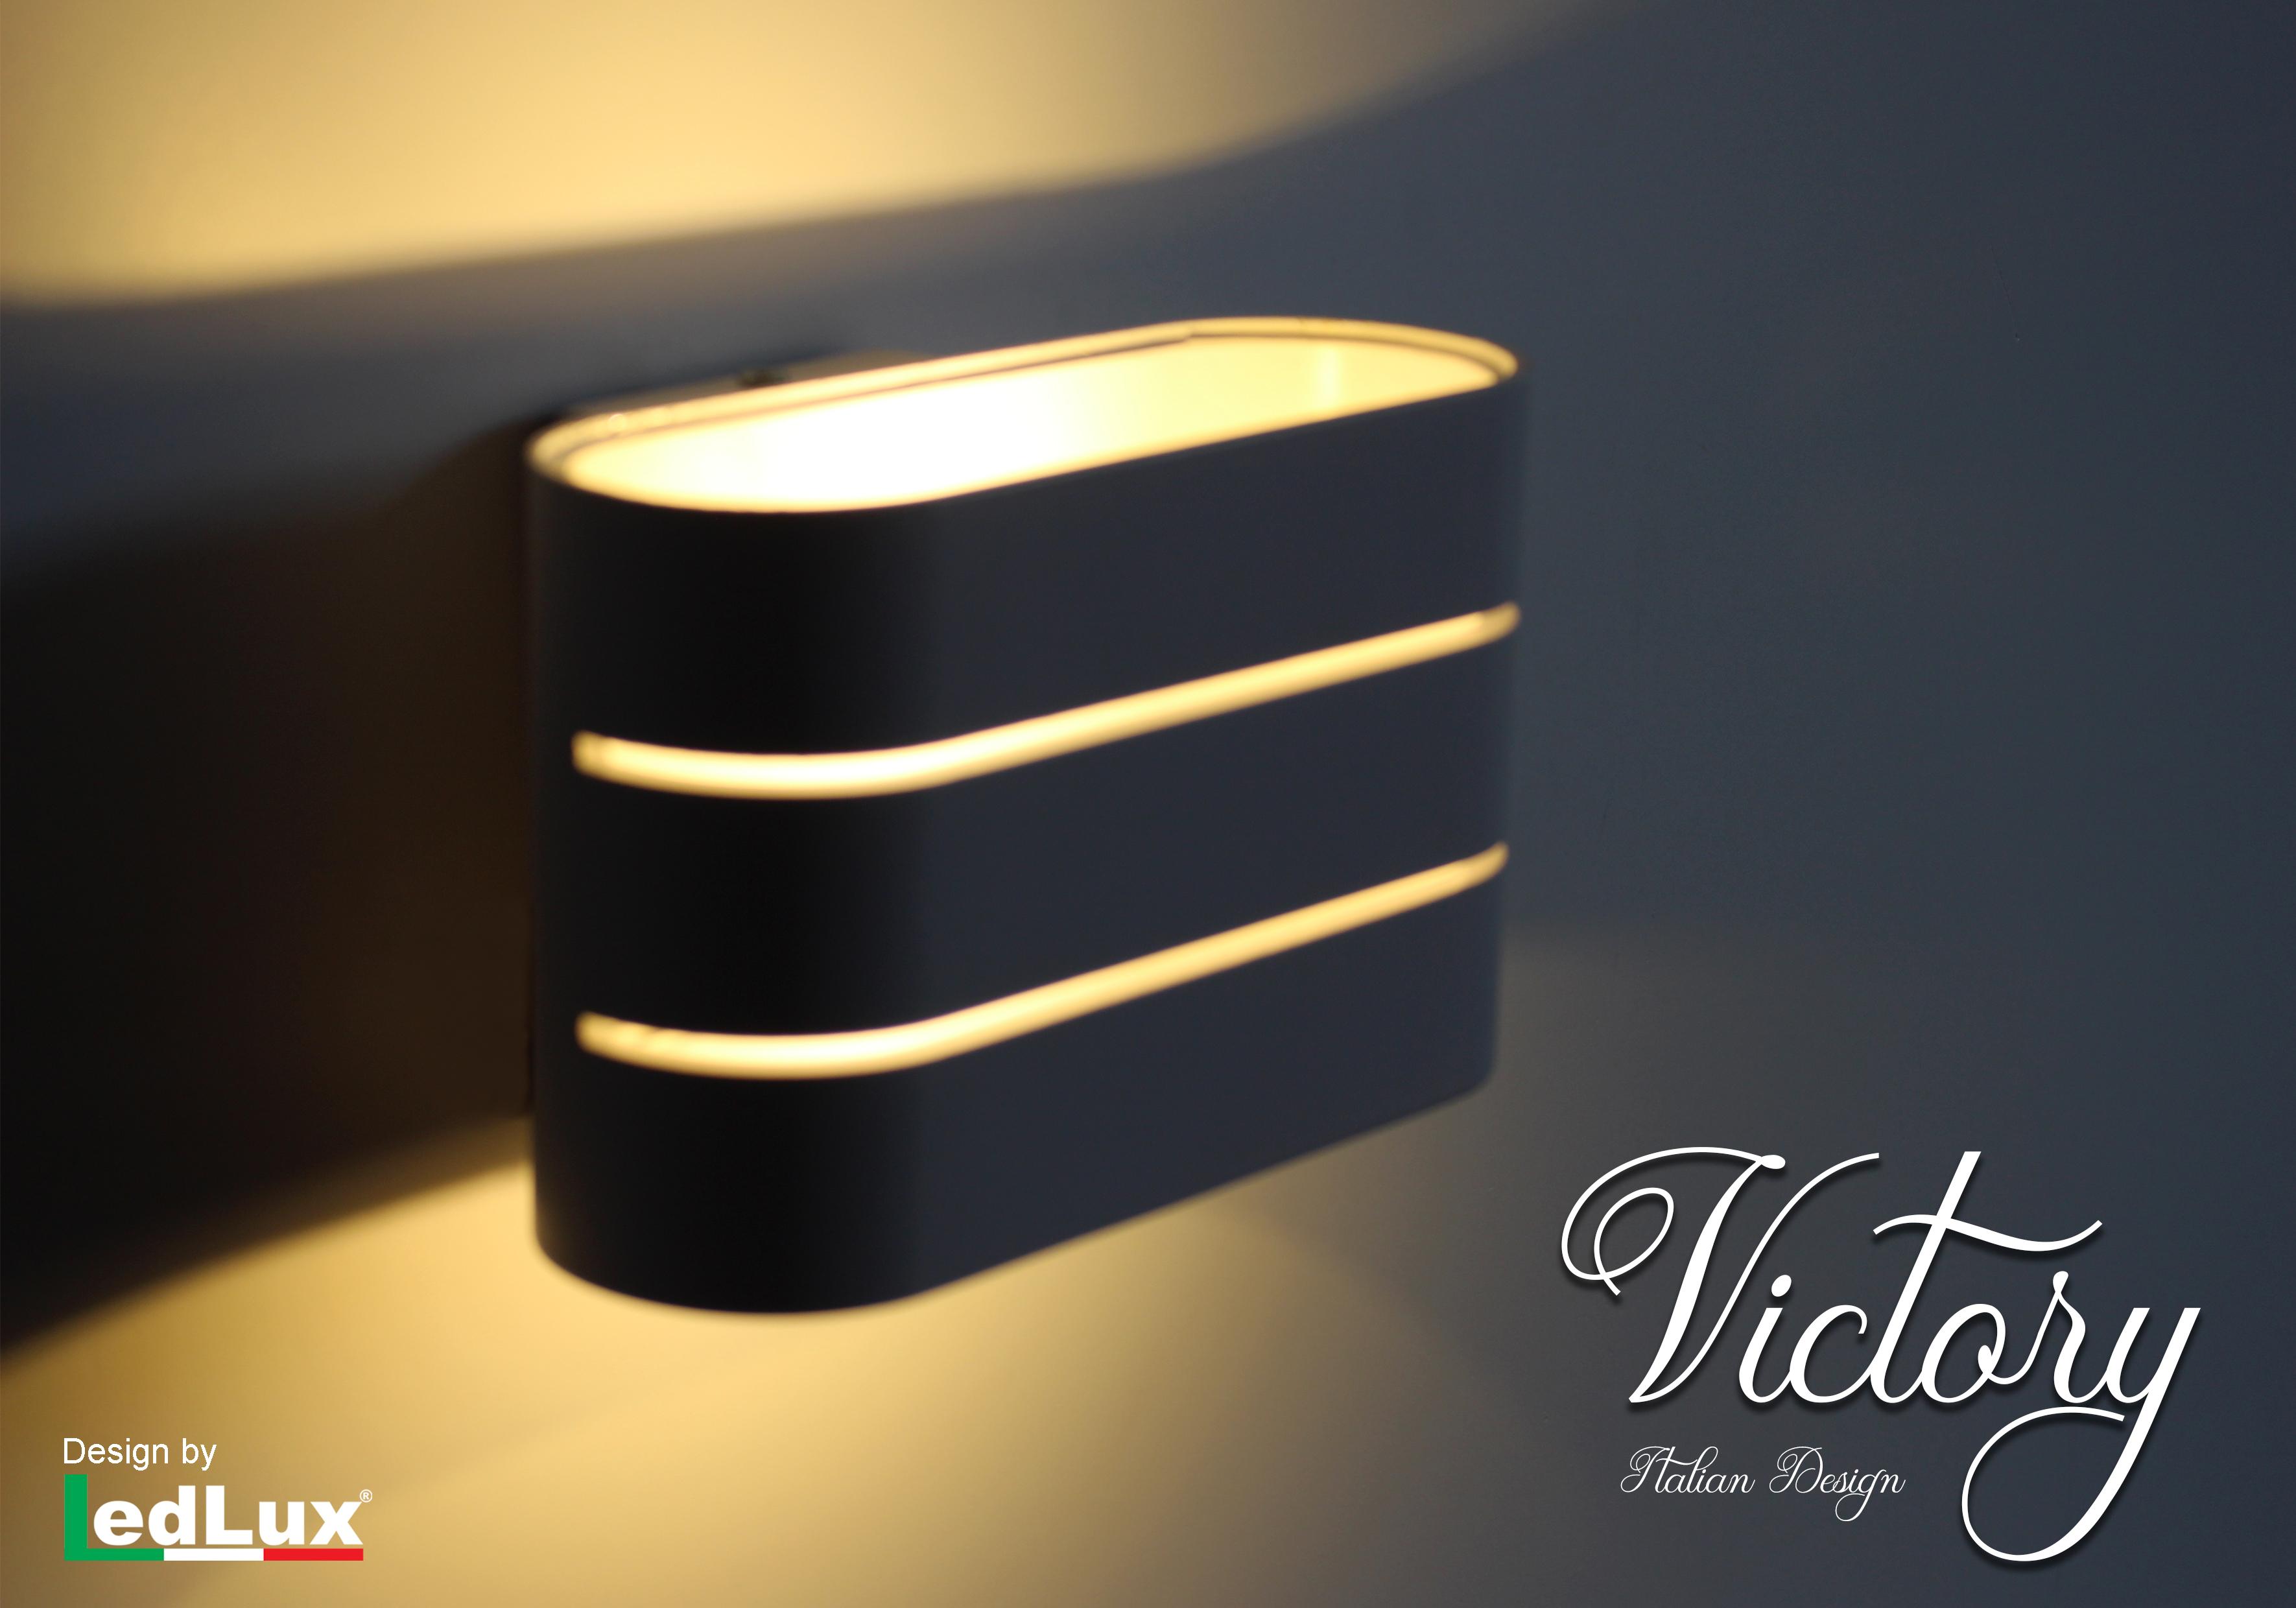 Applique Led Da Parete Modello Victory Italian Design Moderna 6W Bianco Caldo - PZ